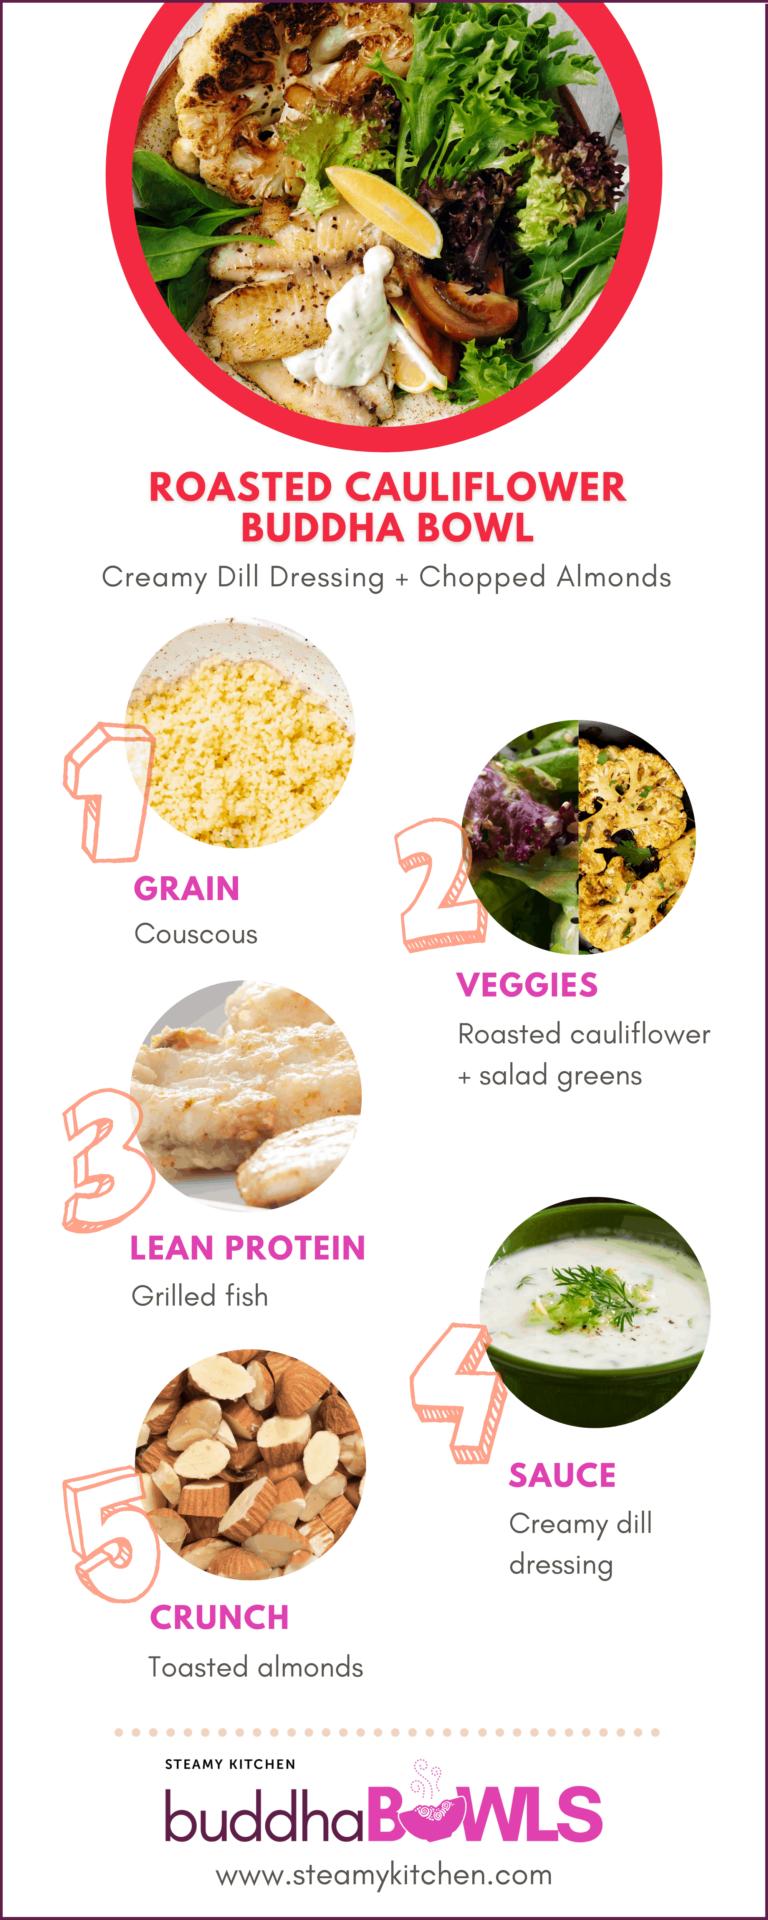 Roasted Cauliflower Buddha Bowl Recipe with Dill Dressing diagram